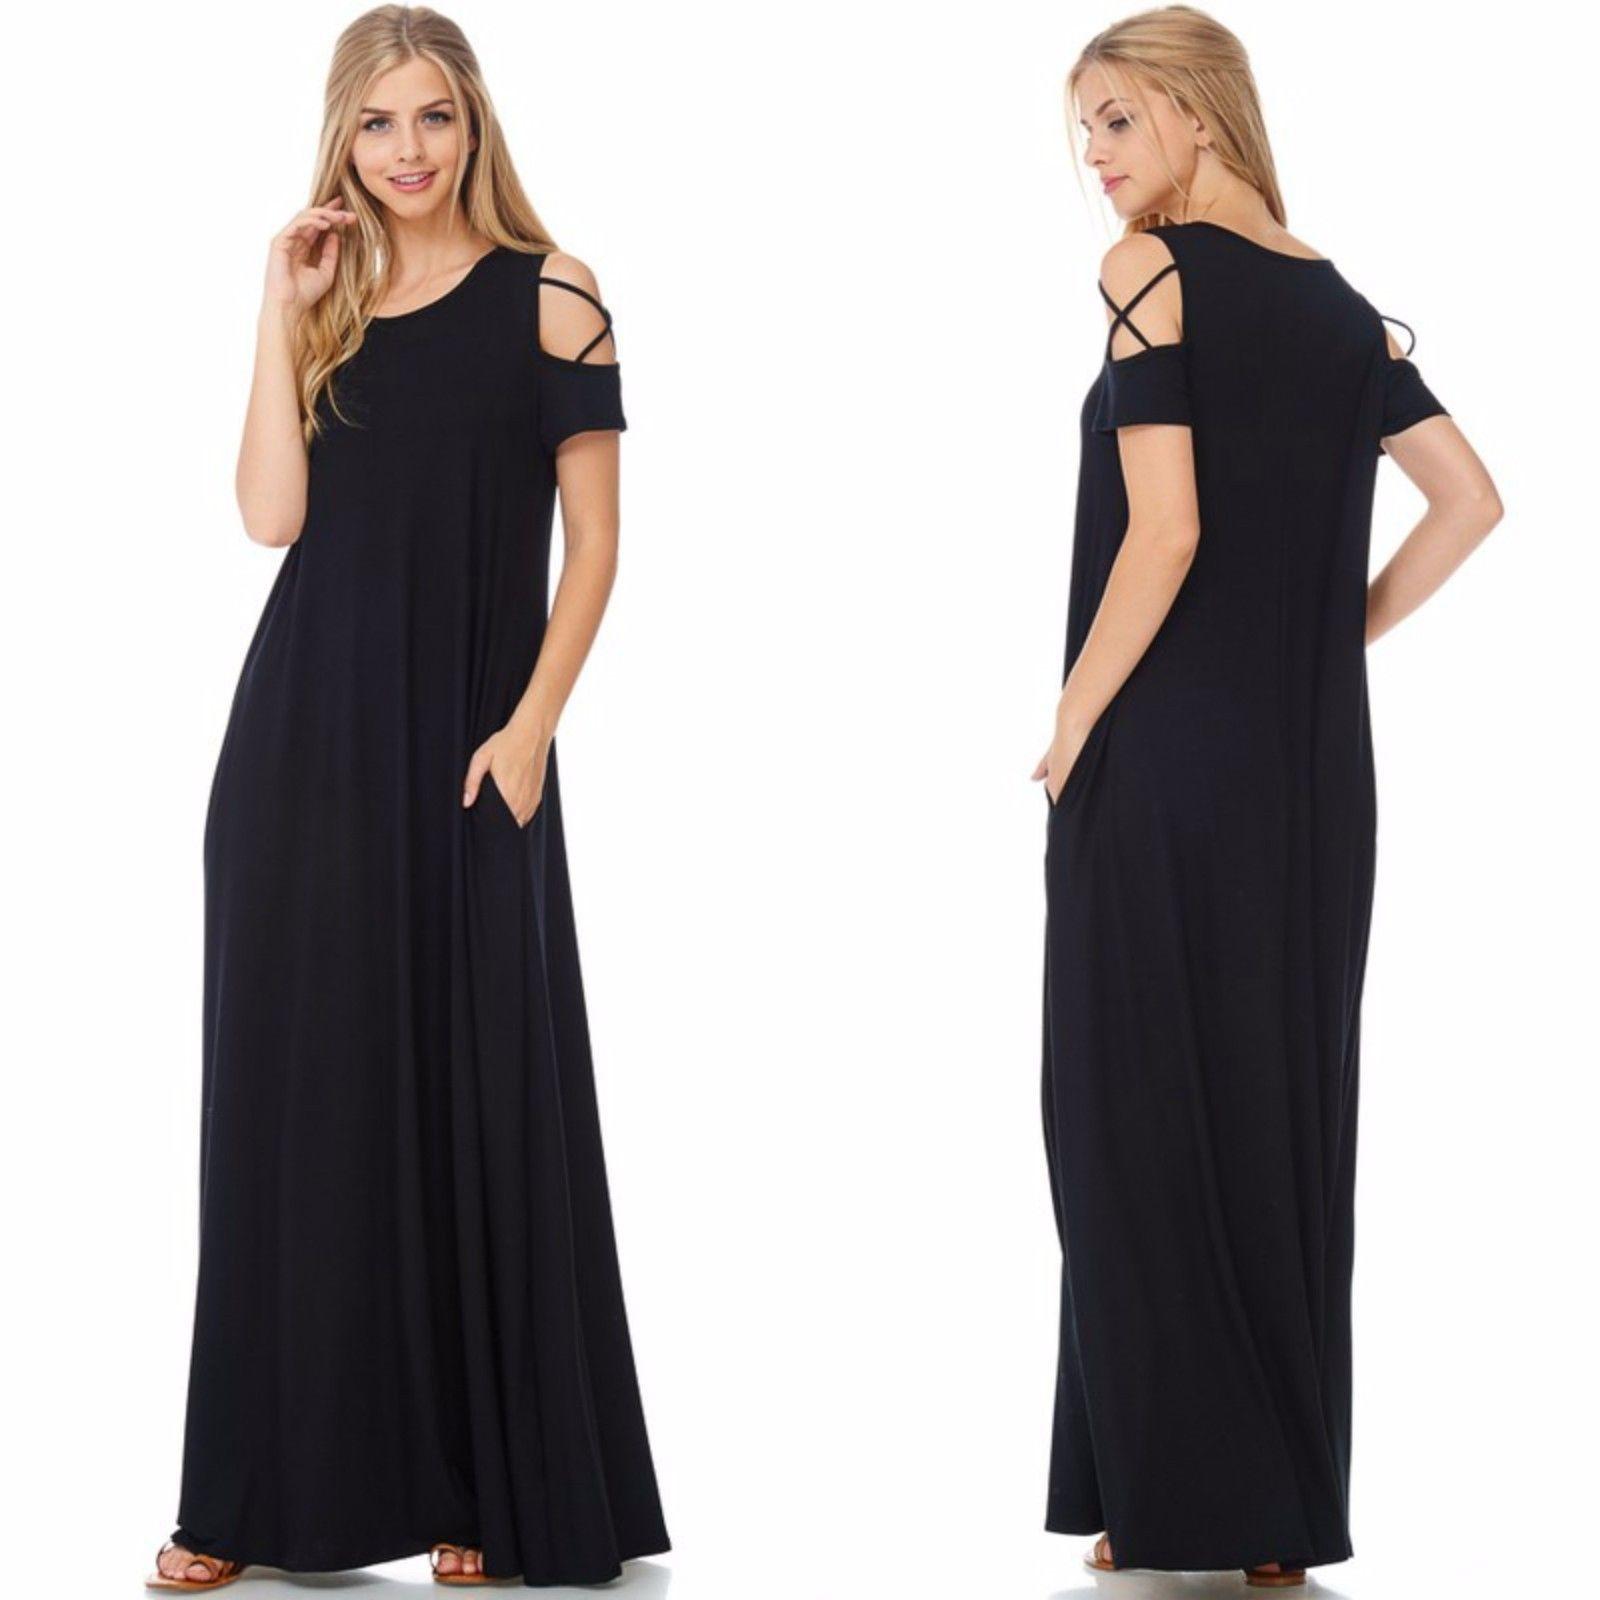 Boho ultra soft knit black cold shoulder flowy maxi dress wpockets